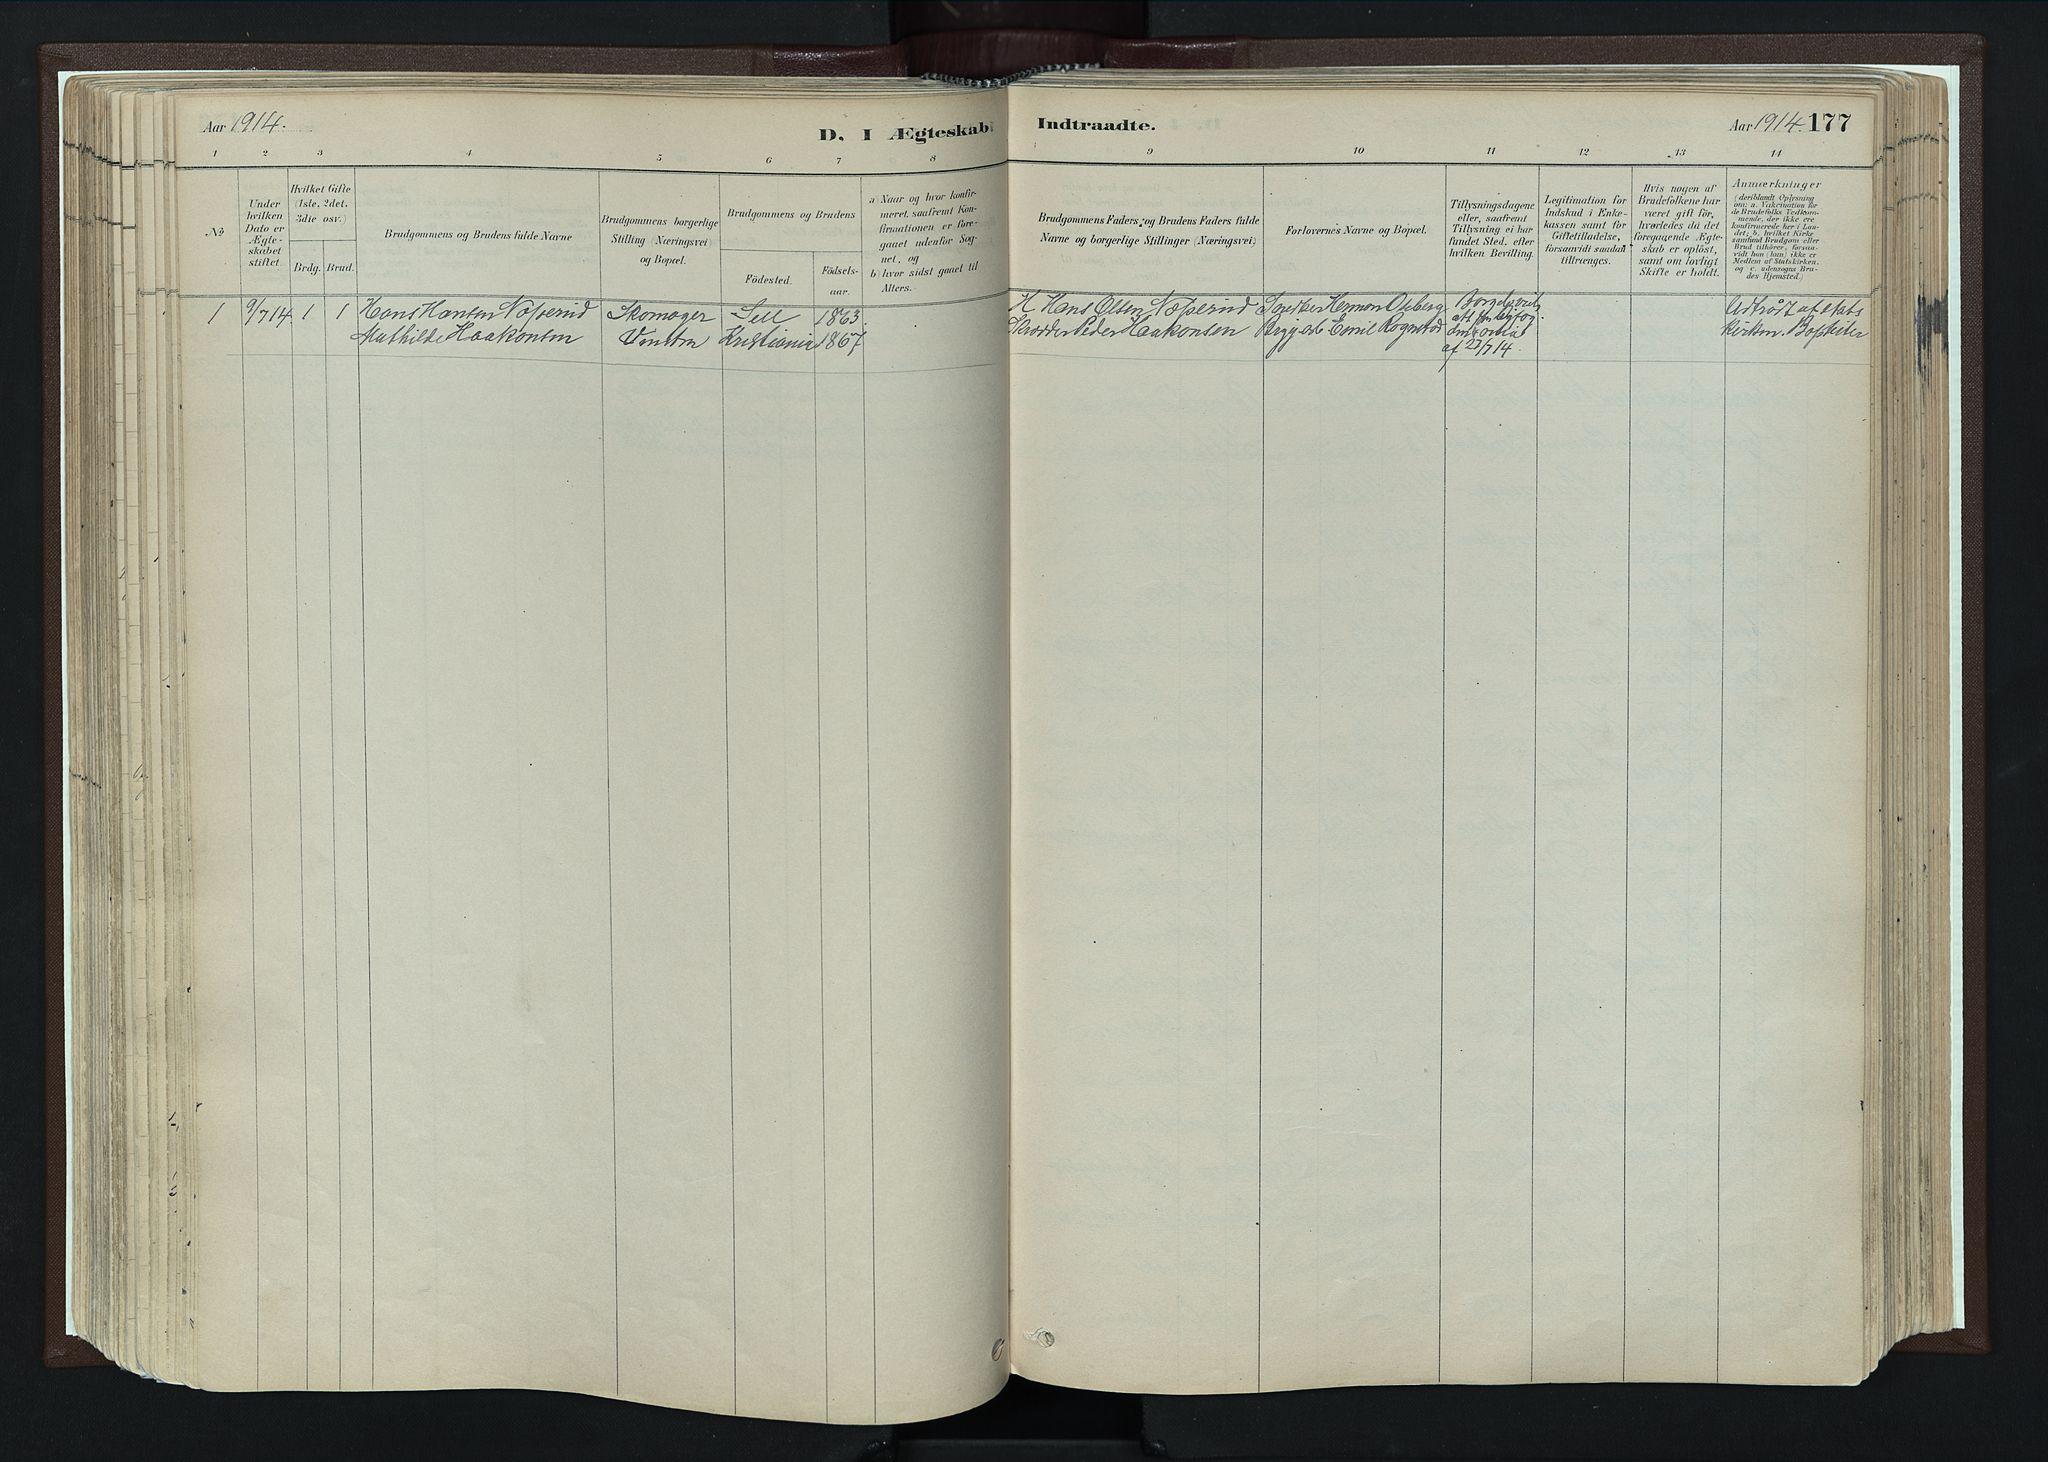 SAH, Nord-Fron prestekontor, Ministerialbok nr. 4, 1884-1914, s. 177